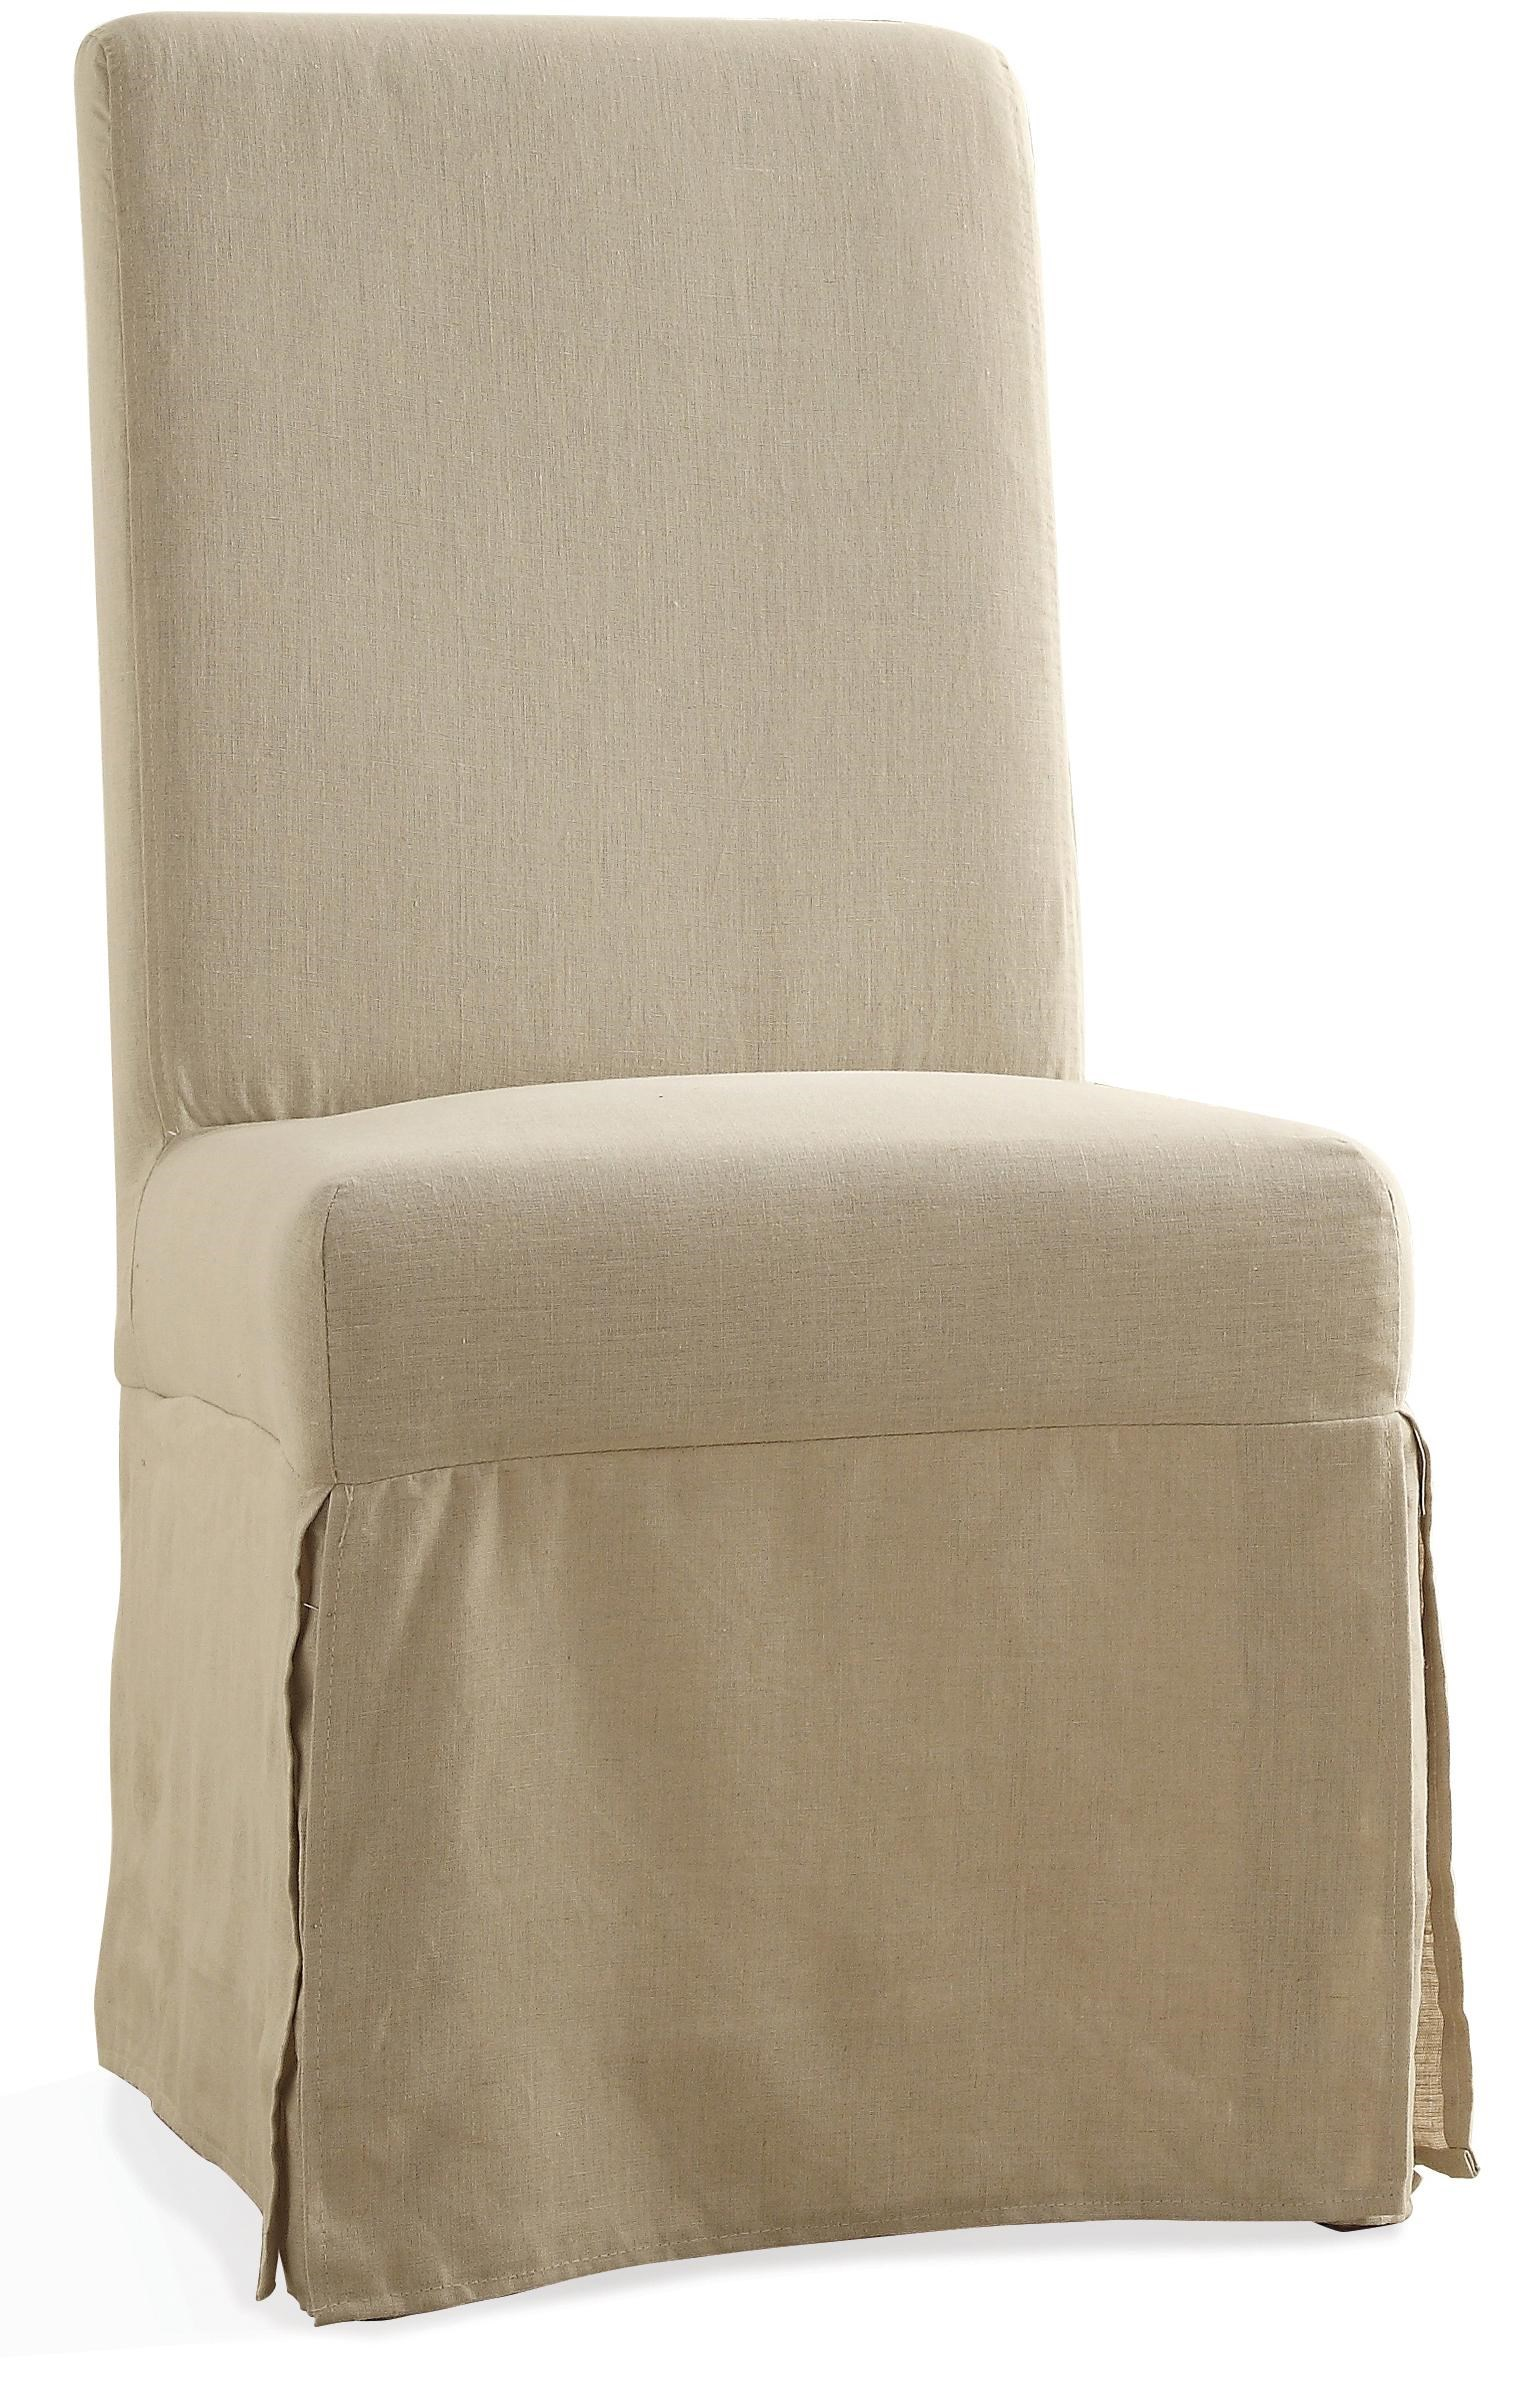 Riverside Furniture Mix N Match Chairs Slipcover Parsonu0027s Chair